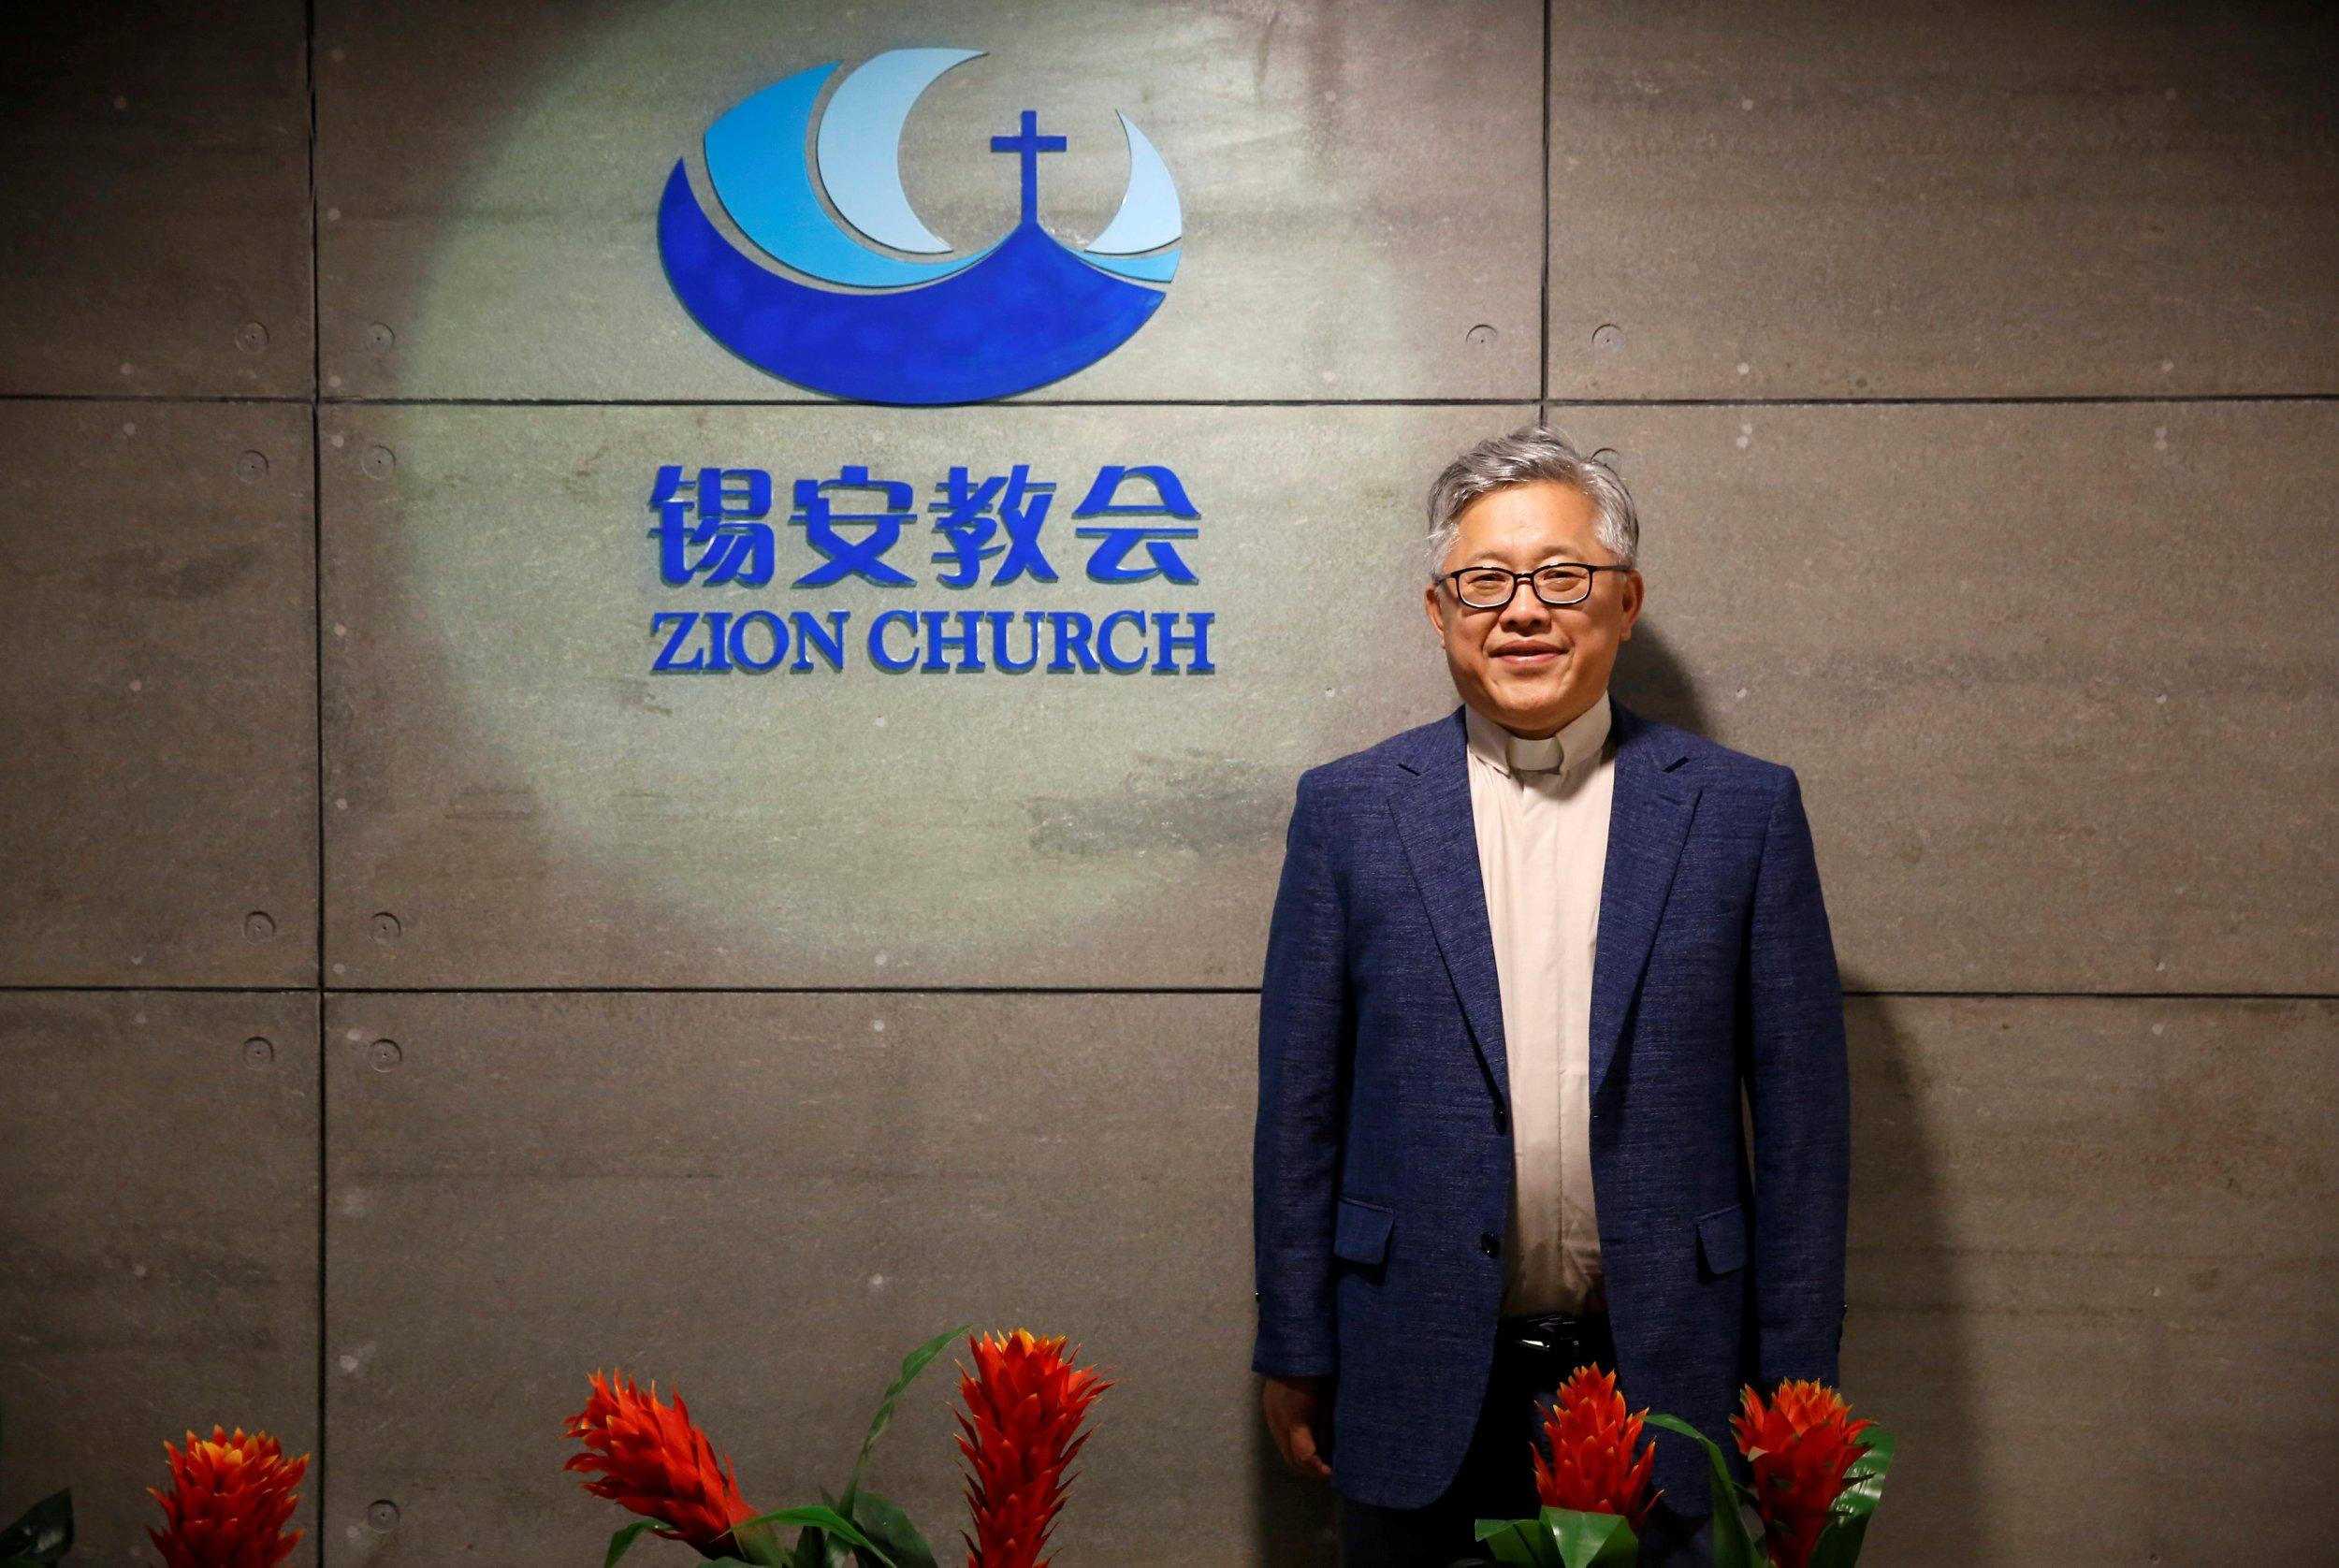 2018-09-10T031120Z_1_LYNXNPEE89065_RTROPTP_4_CHINA-RELIGION